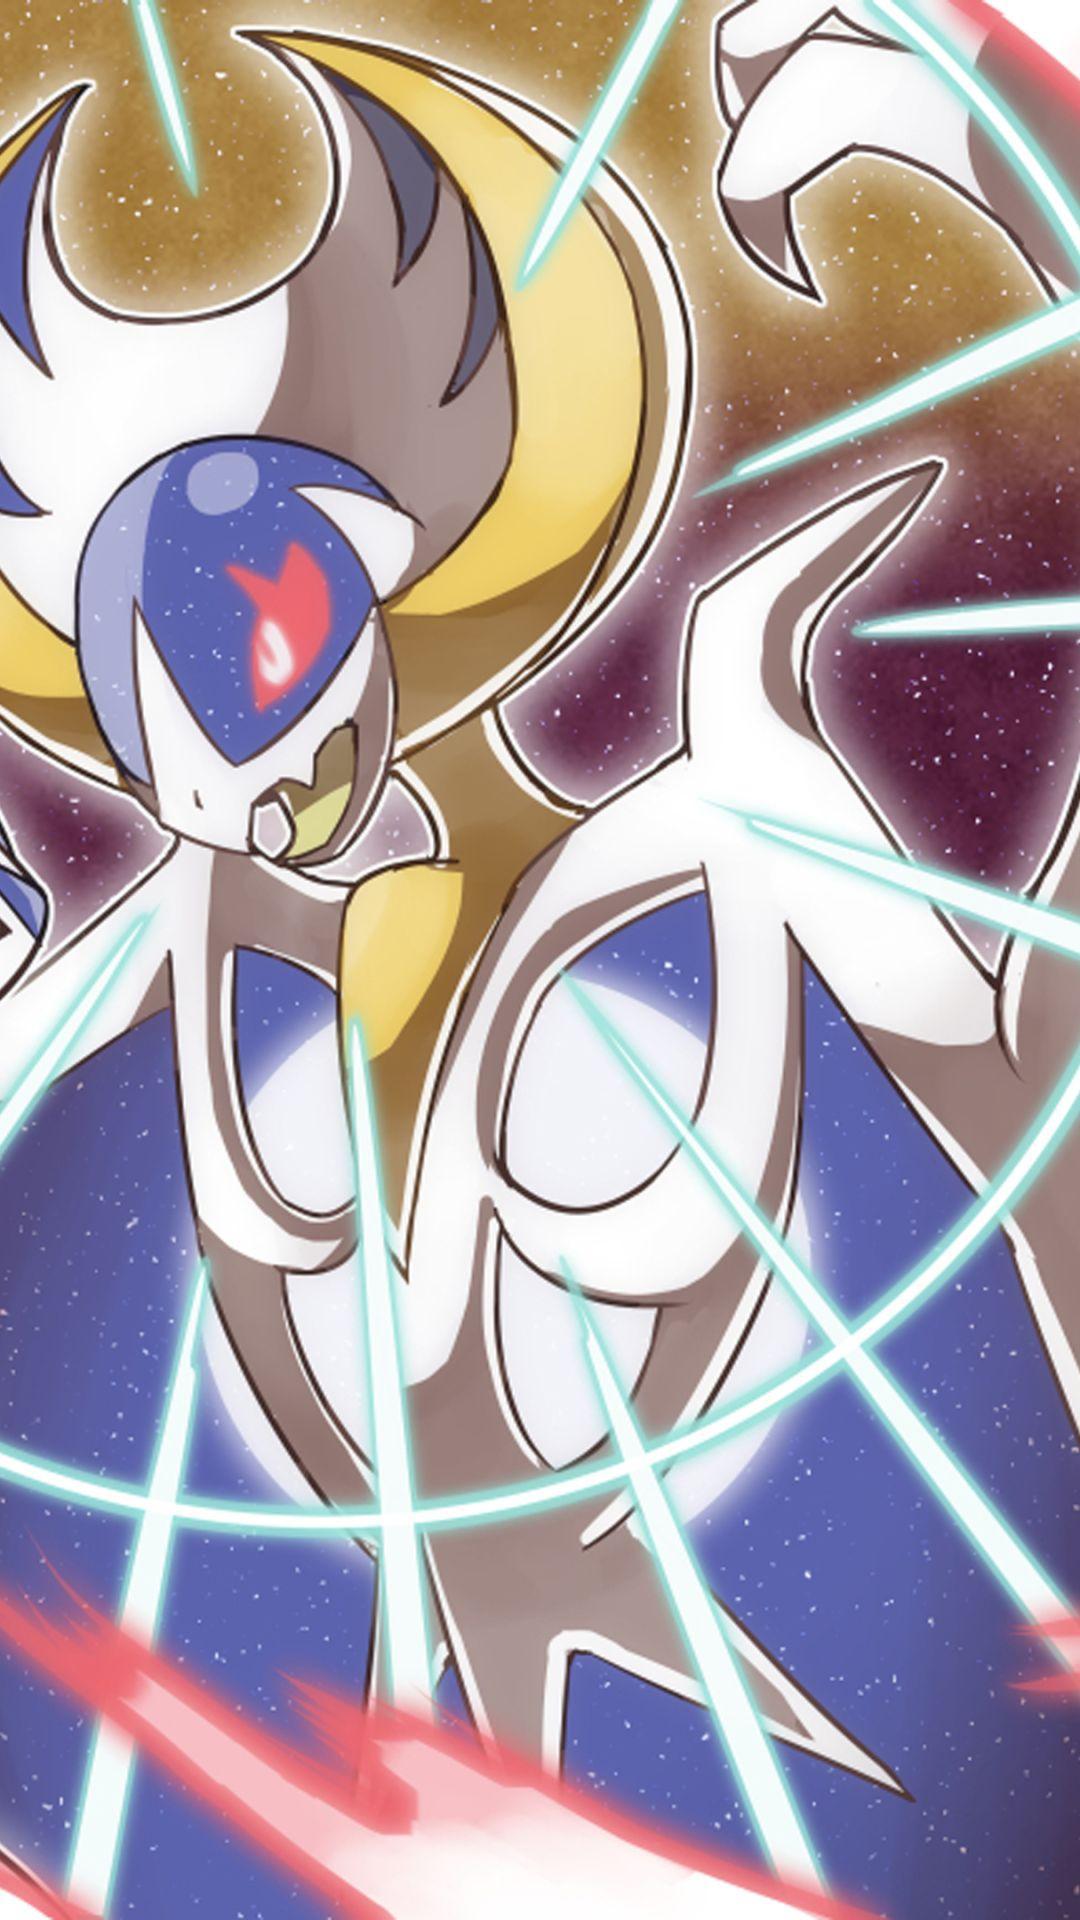 Solgaleo Pokemon Sun and Moon Wallpapers - Top Free ...